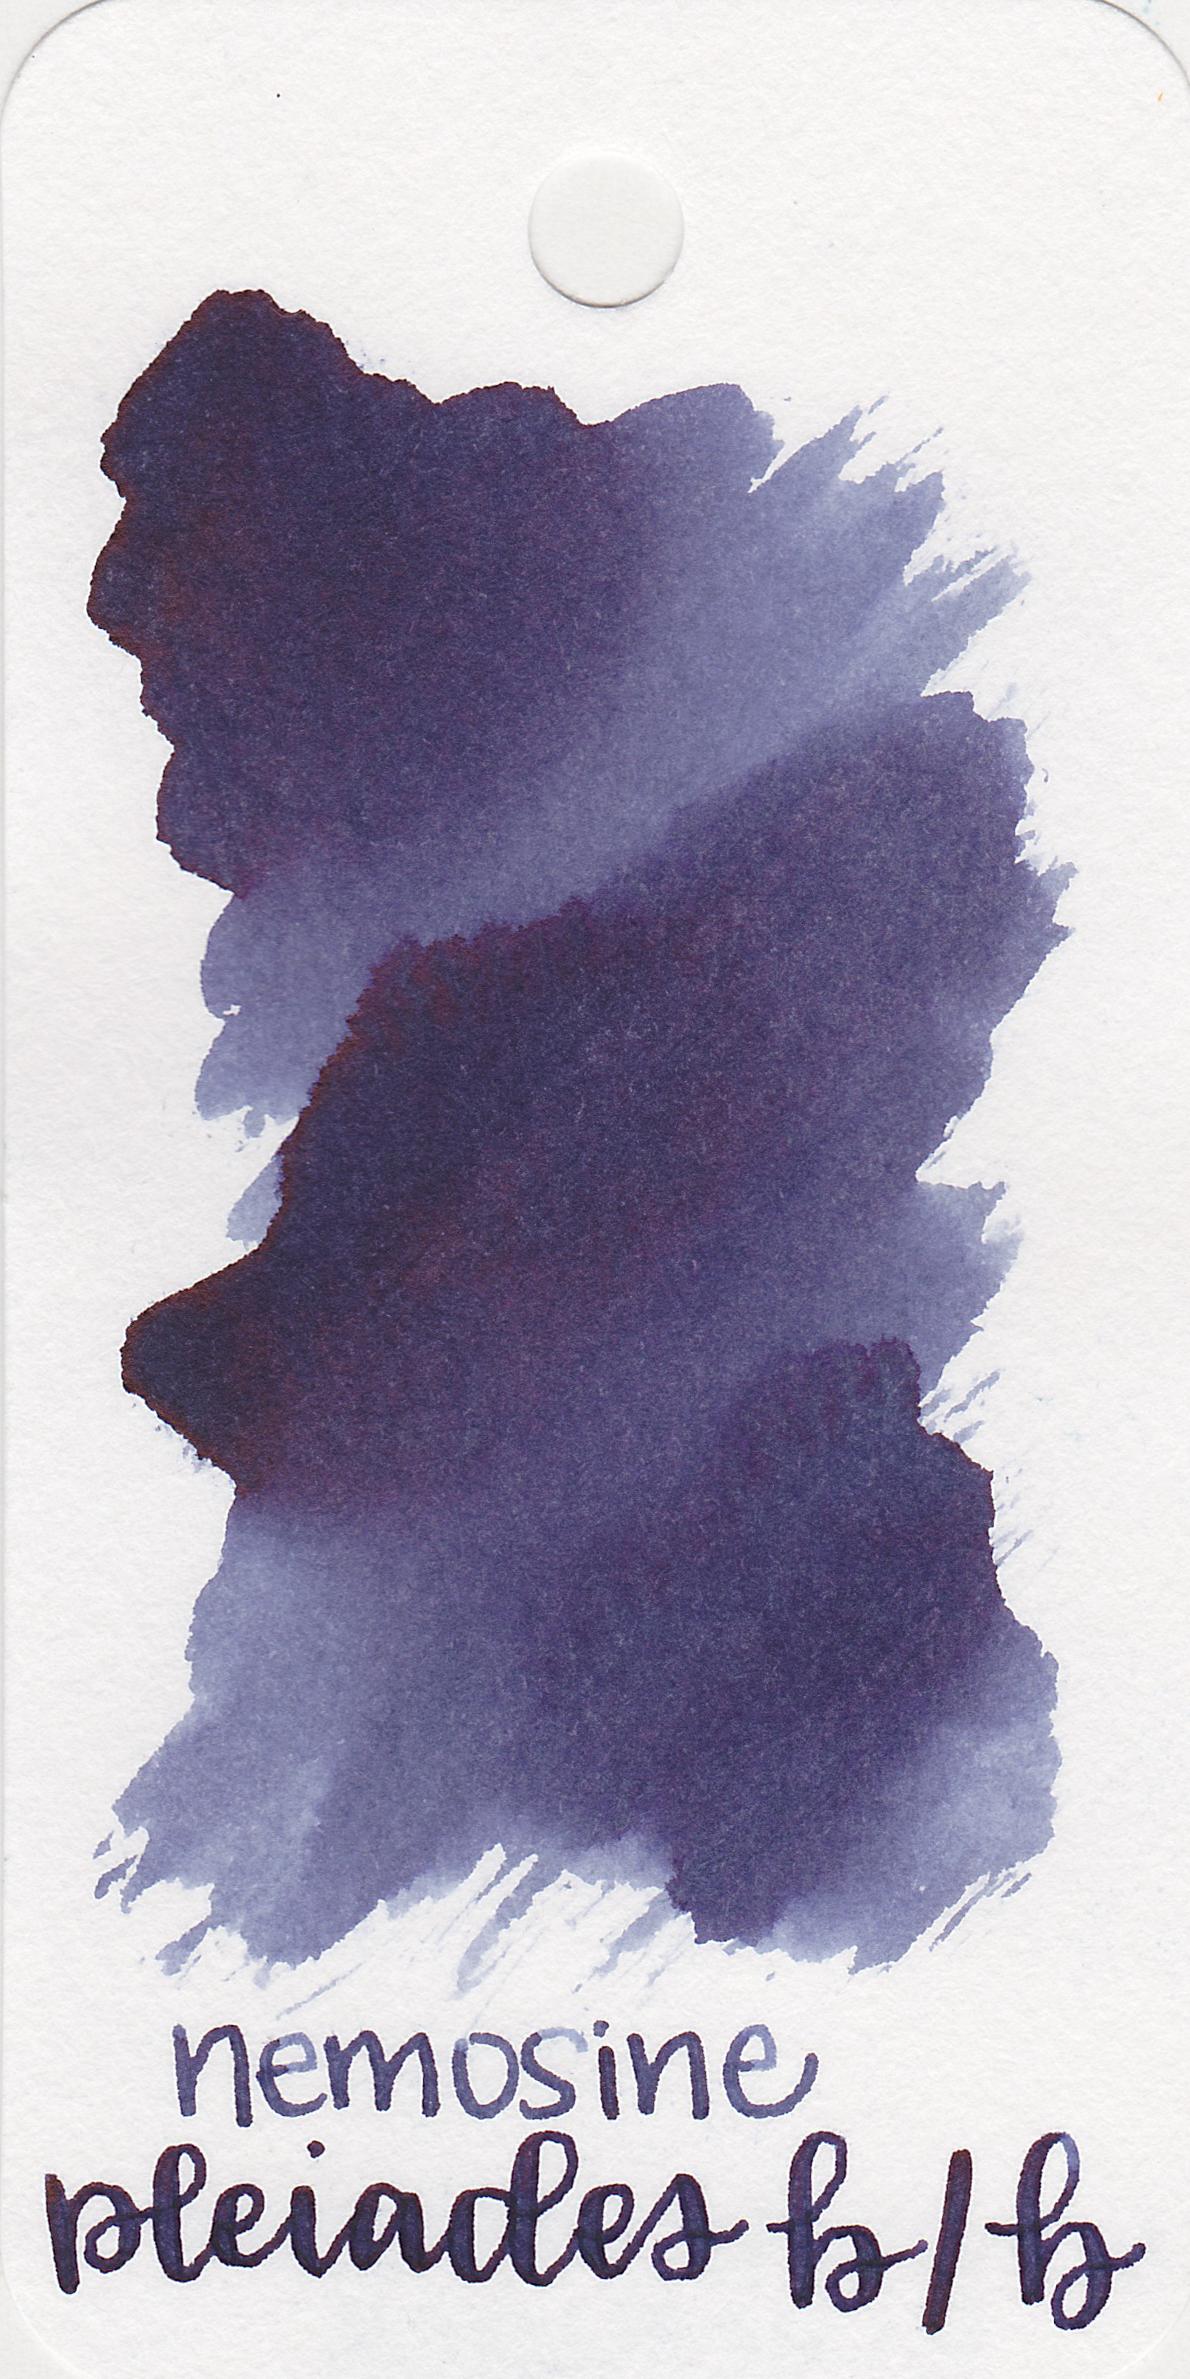 nemo-pleiades-blue-black-1.jpg